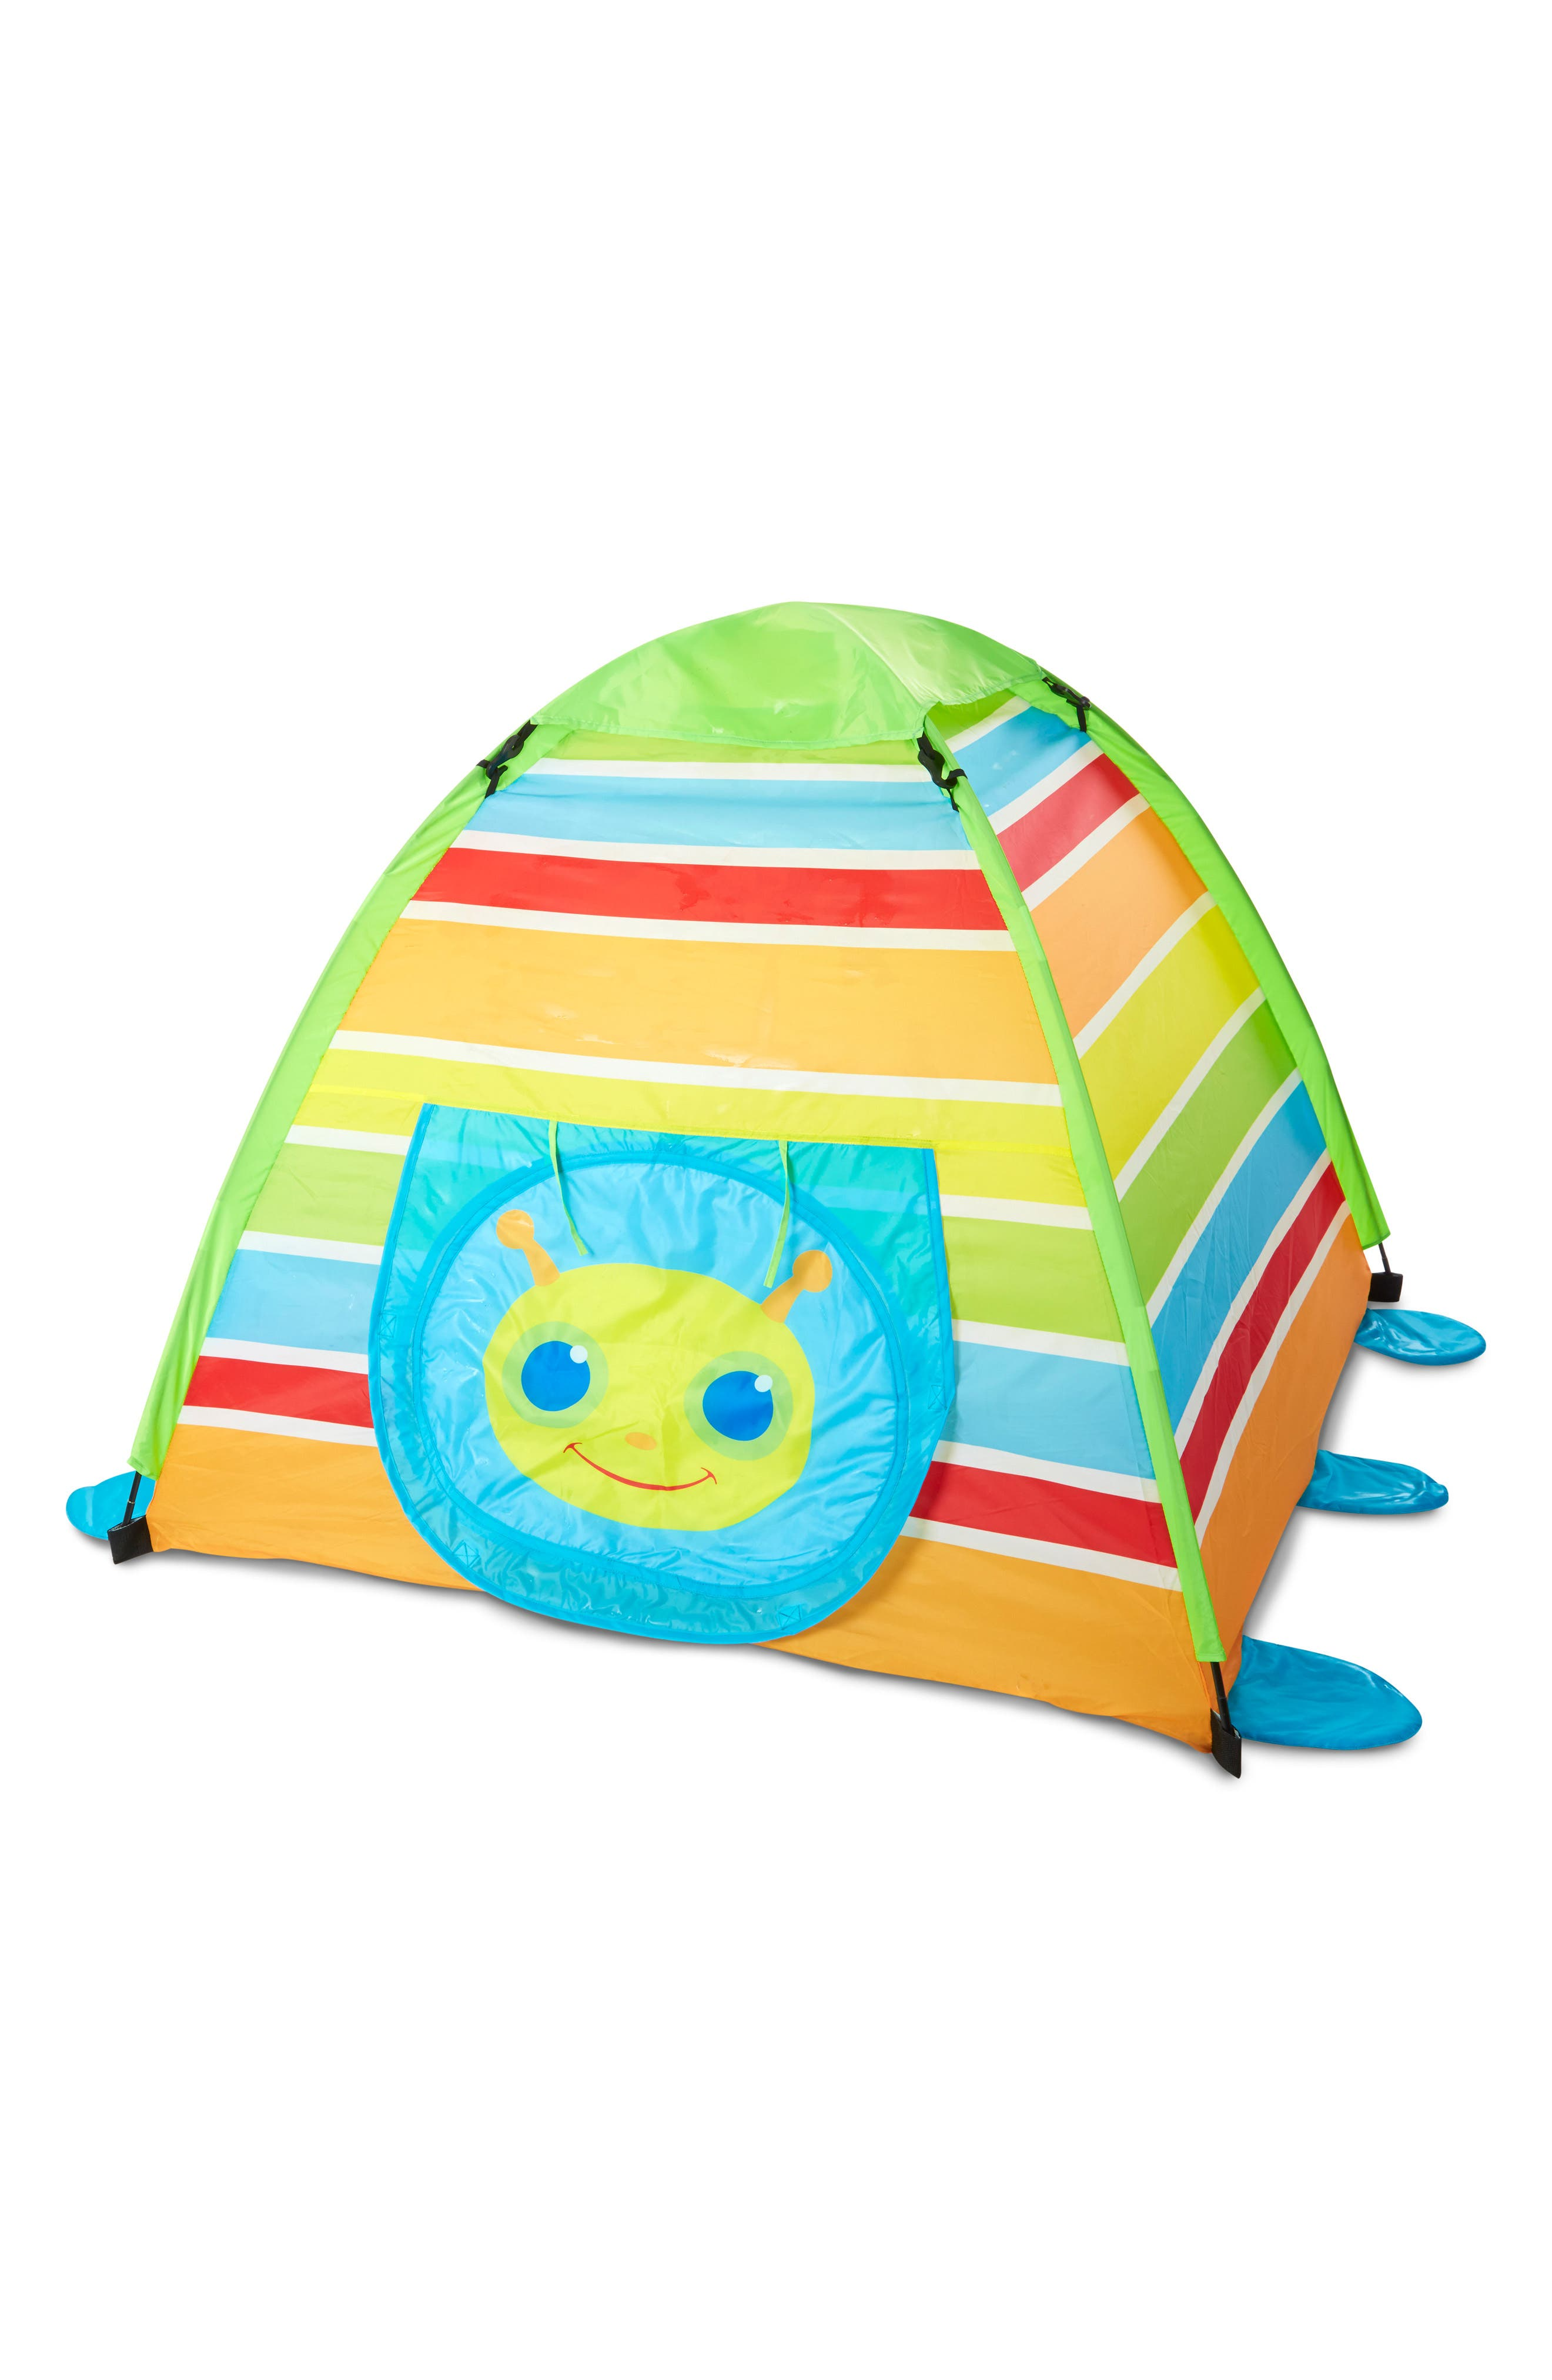 Giddy Buggy Tent,                             Main thumbnail 1, color,                             300